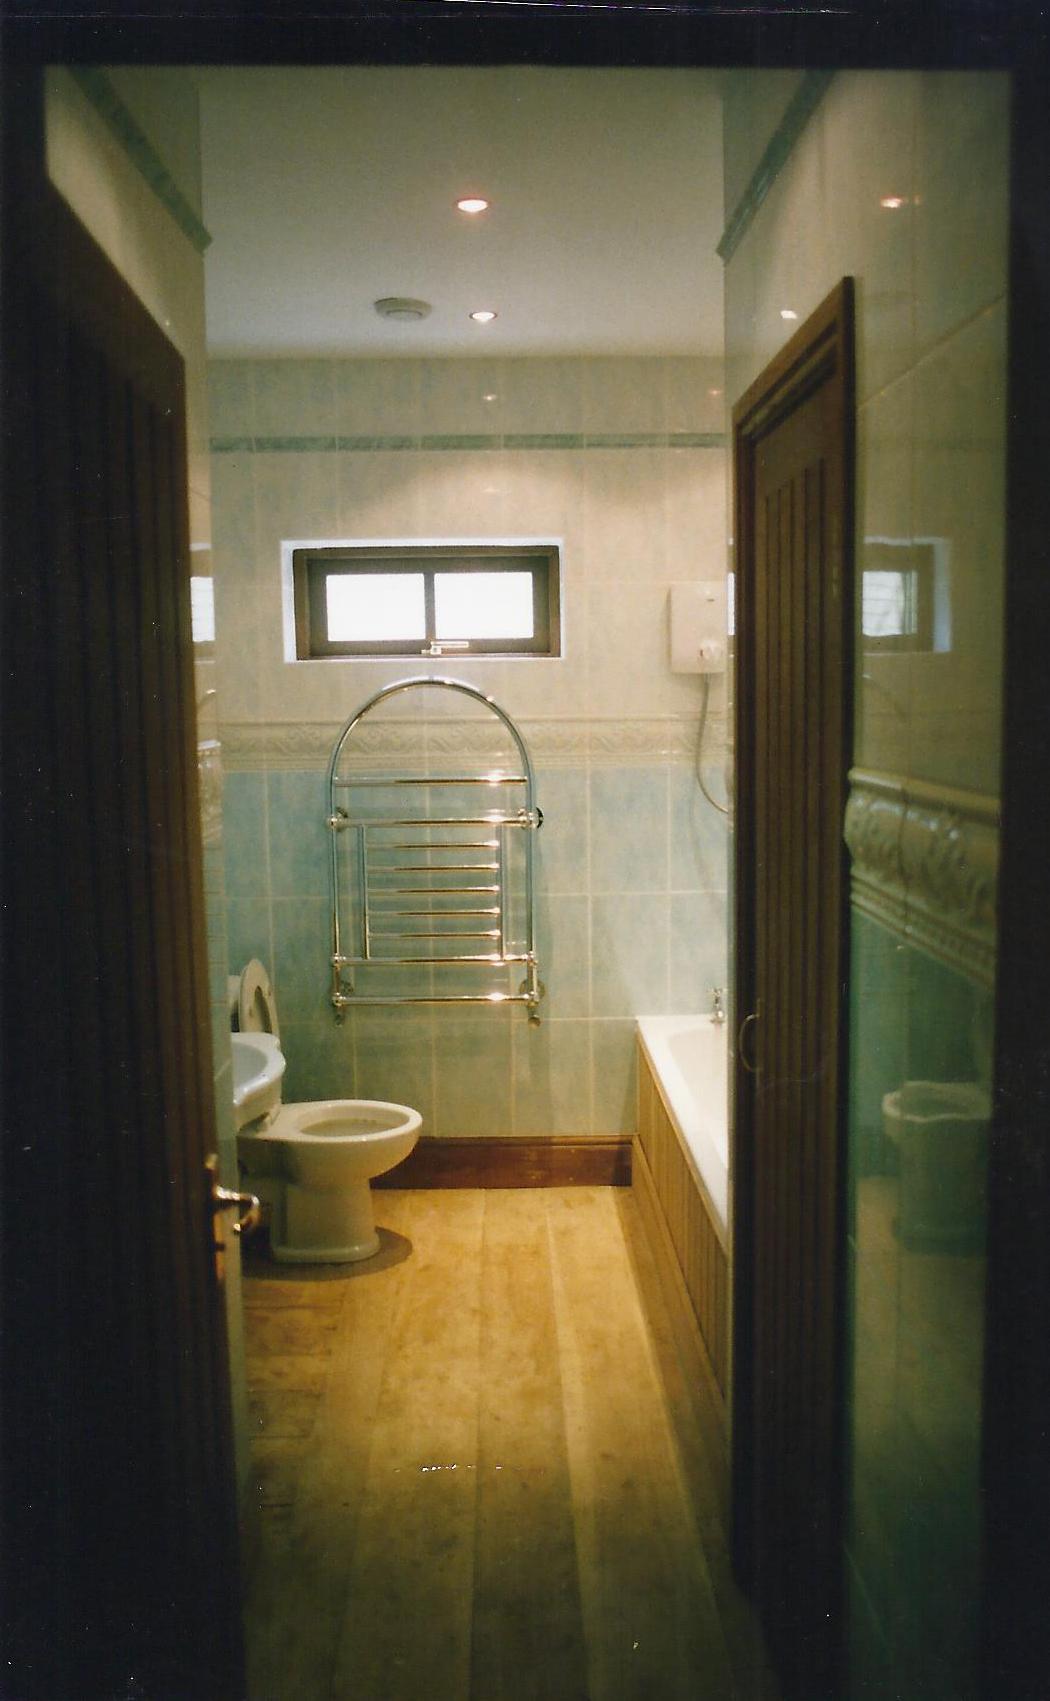 Bathroom Image 1 - North End Farm - East Yorkshire Architects - Samuel Kendall Associates